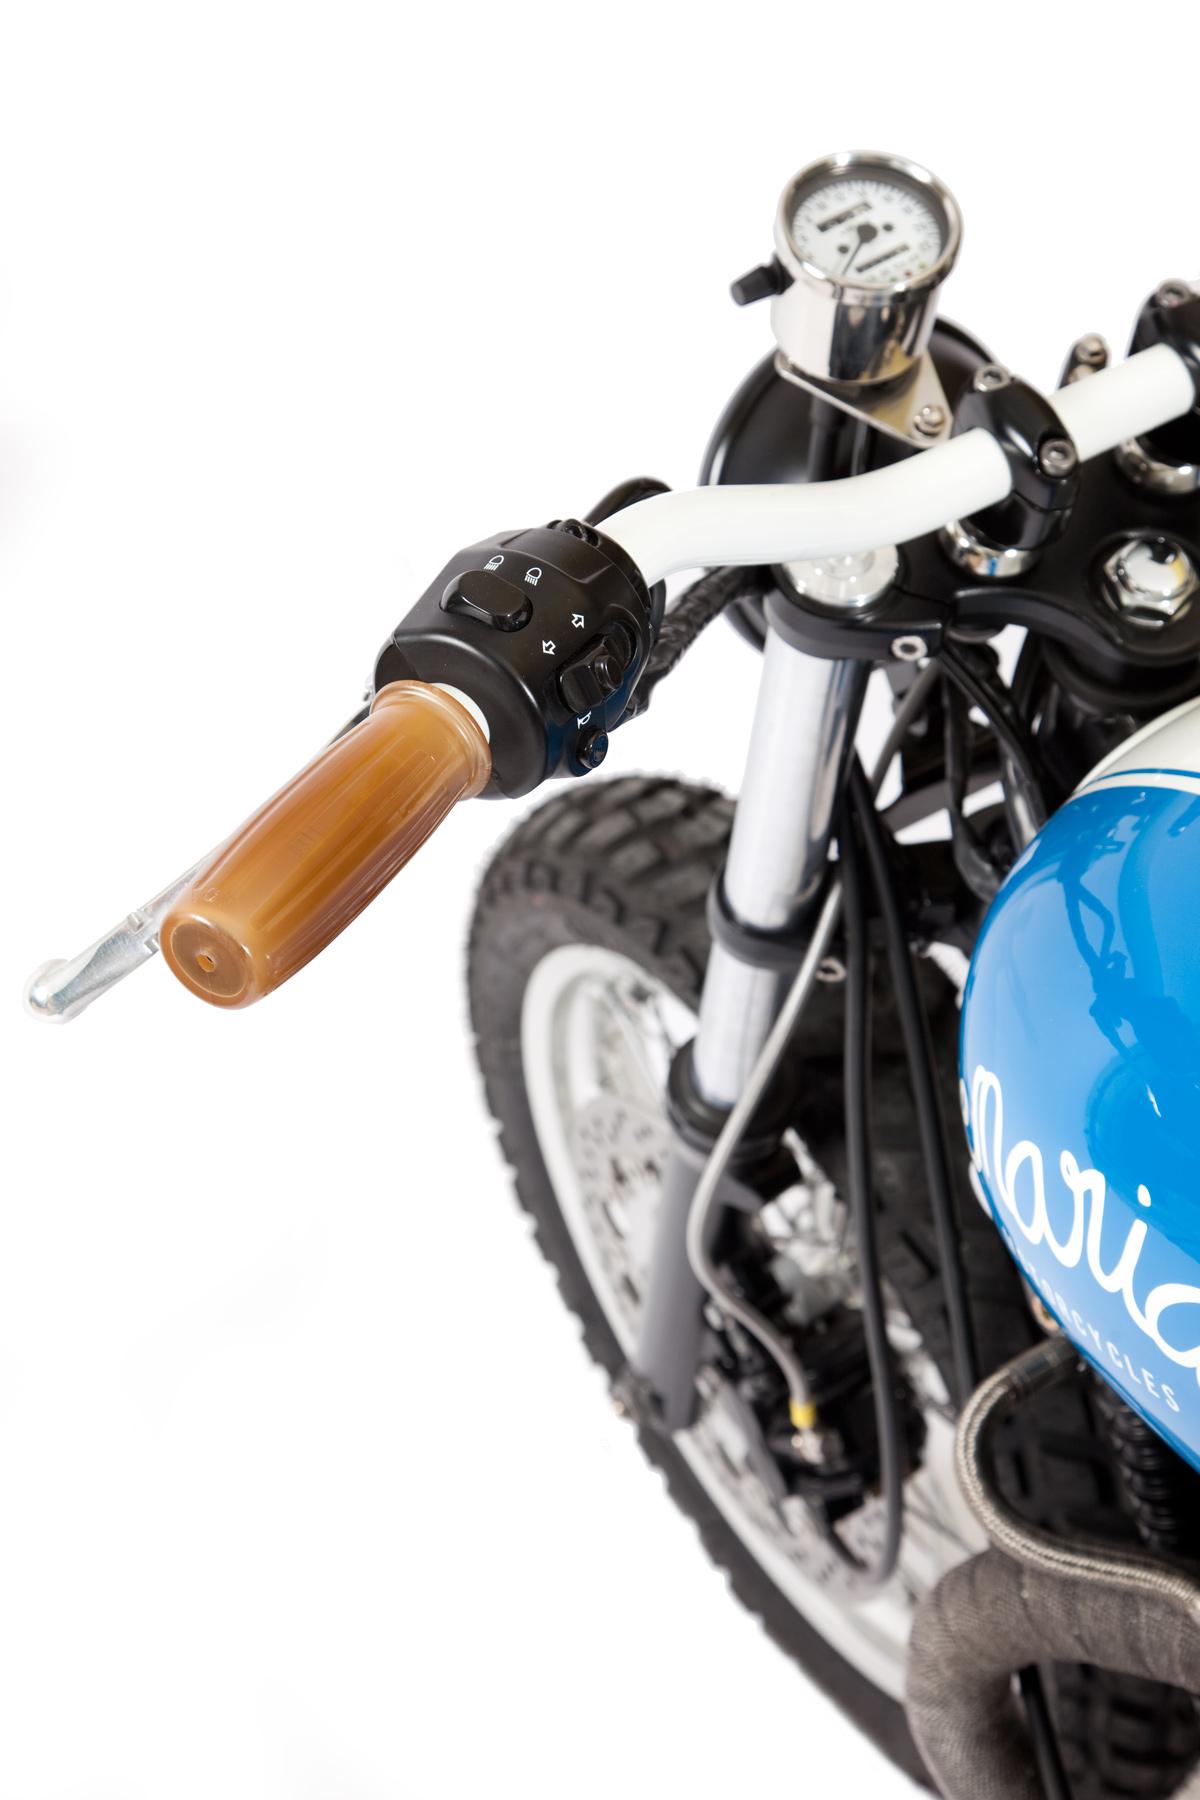 maria_motorcycles_triumph_thruxton_mightyblue_7358